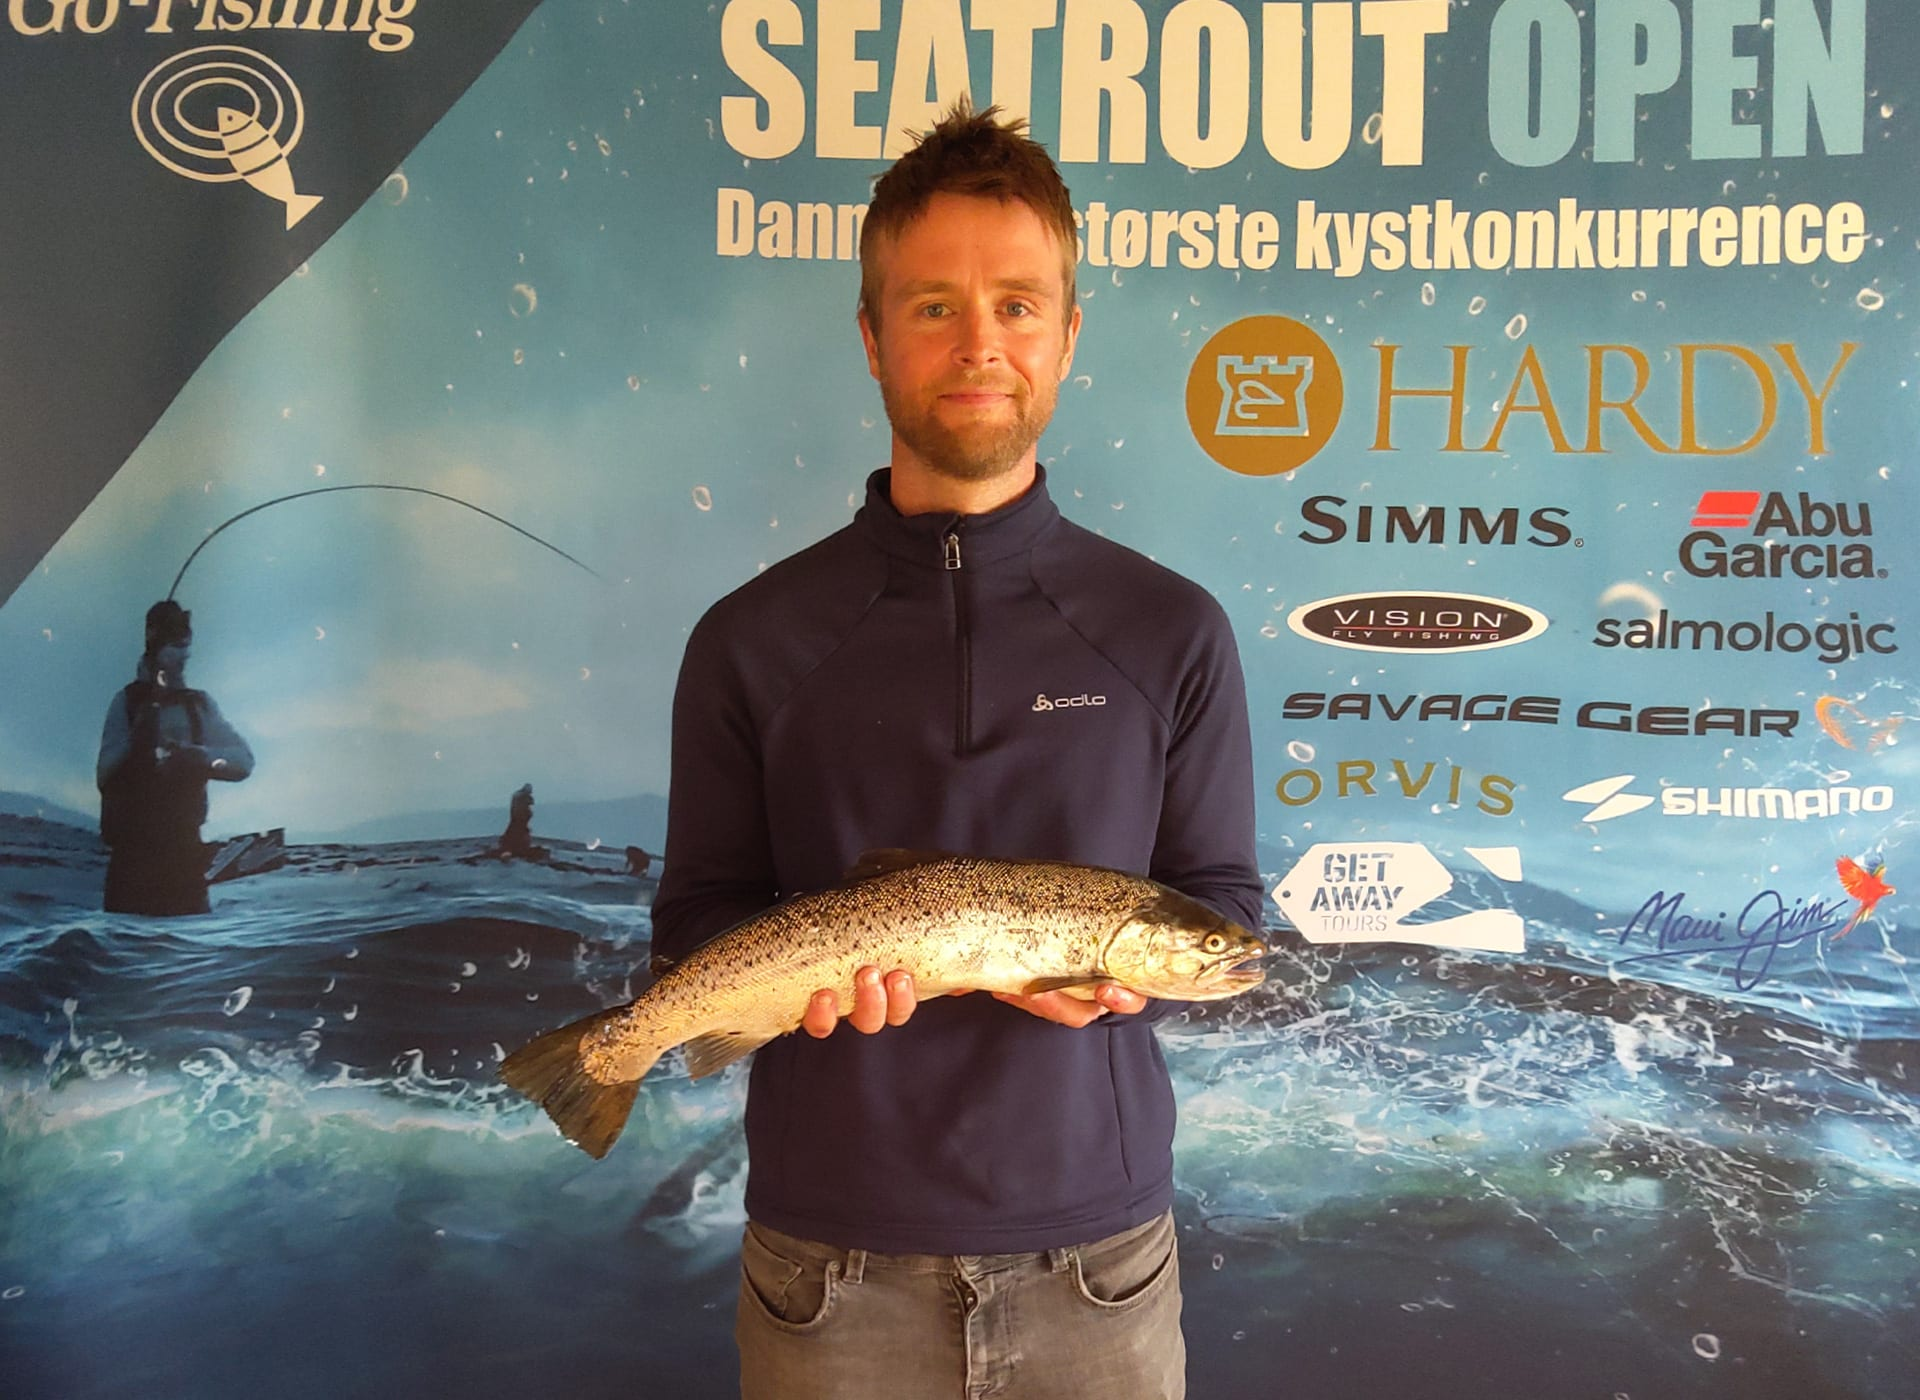 Seatrout Open deltager Claus Pedersen